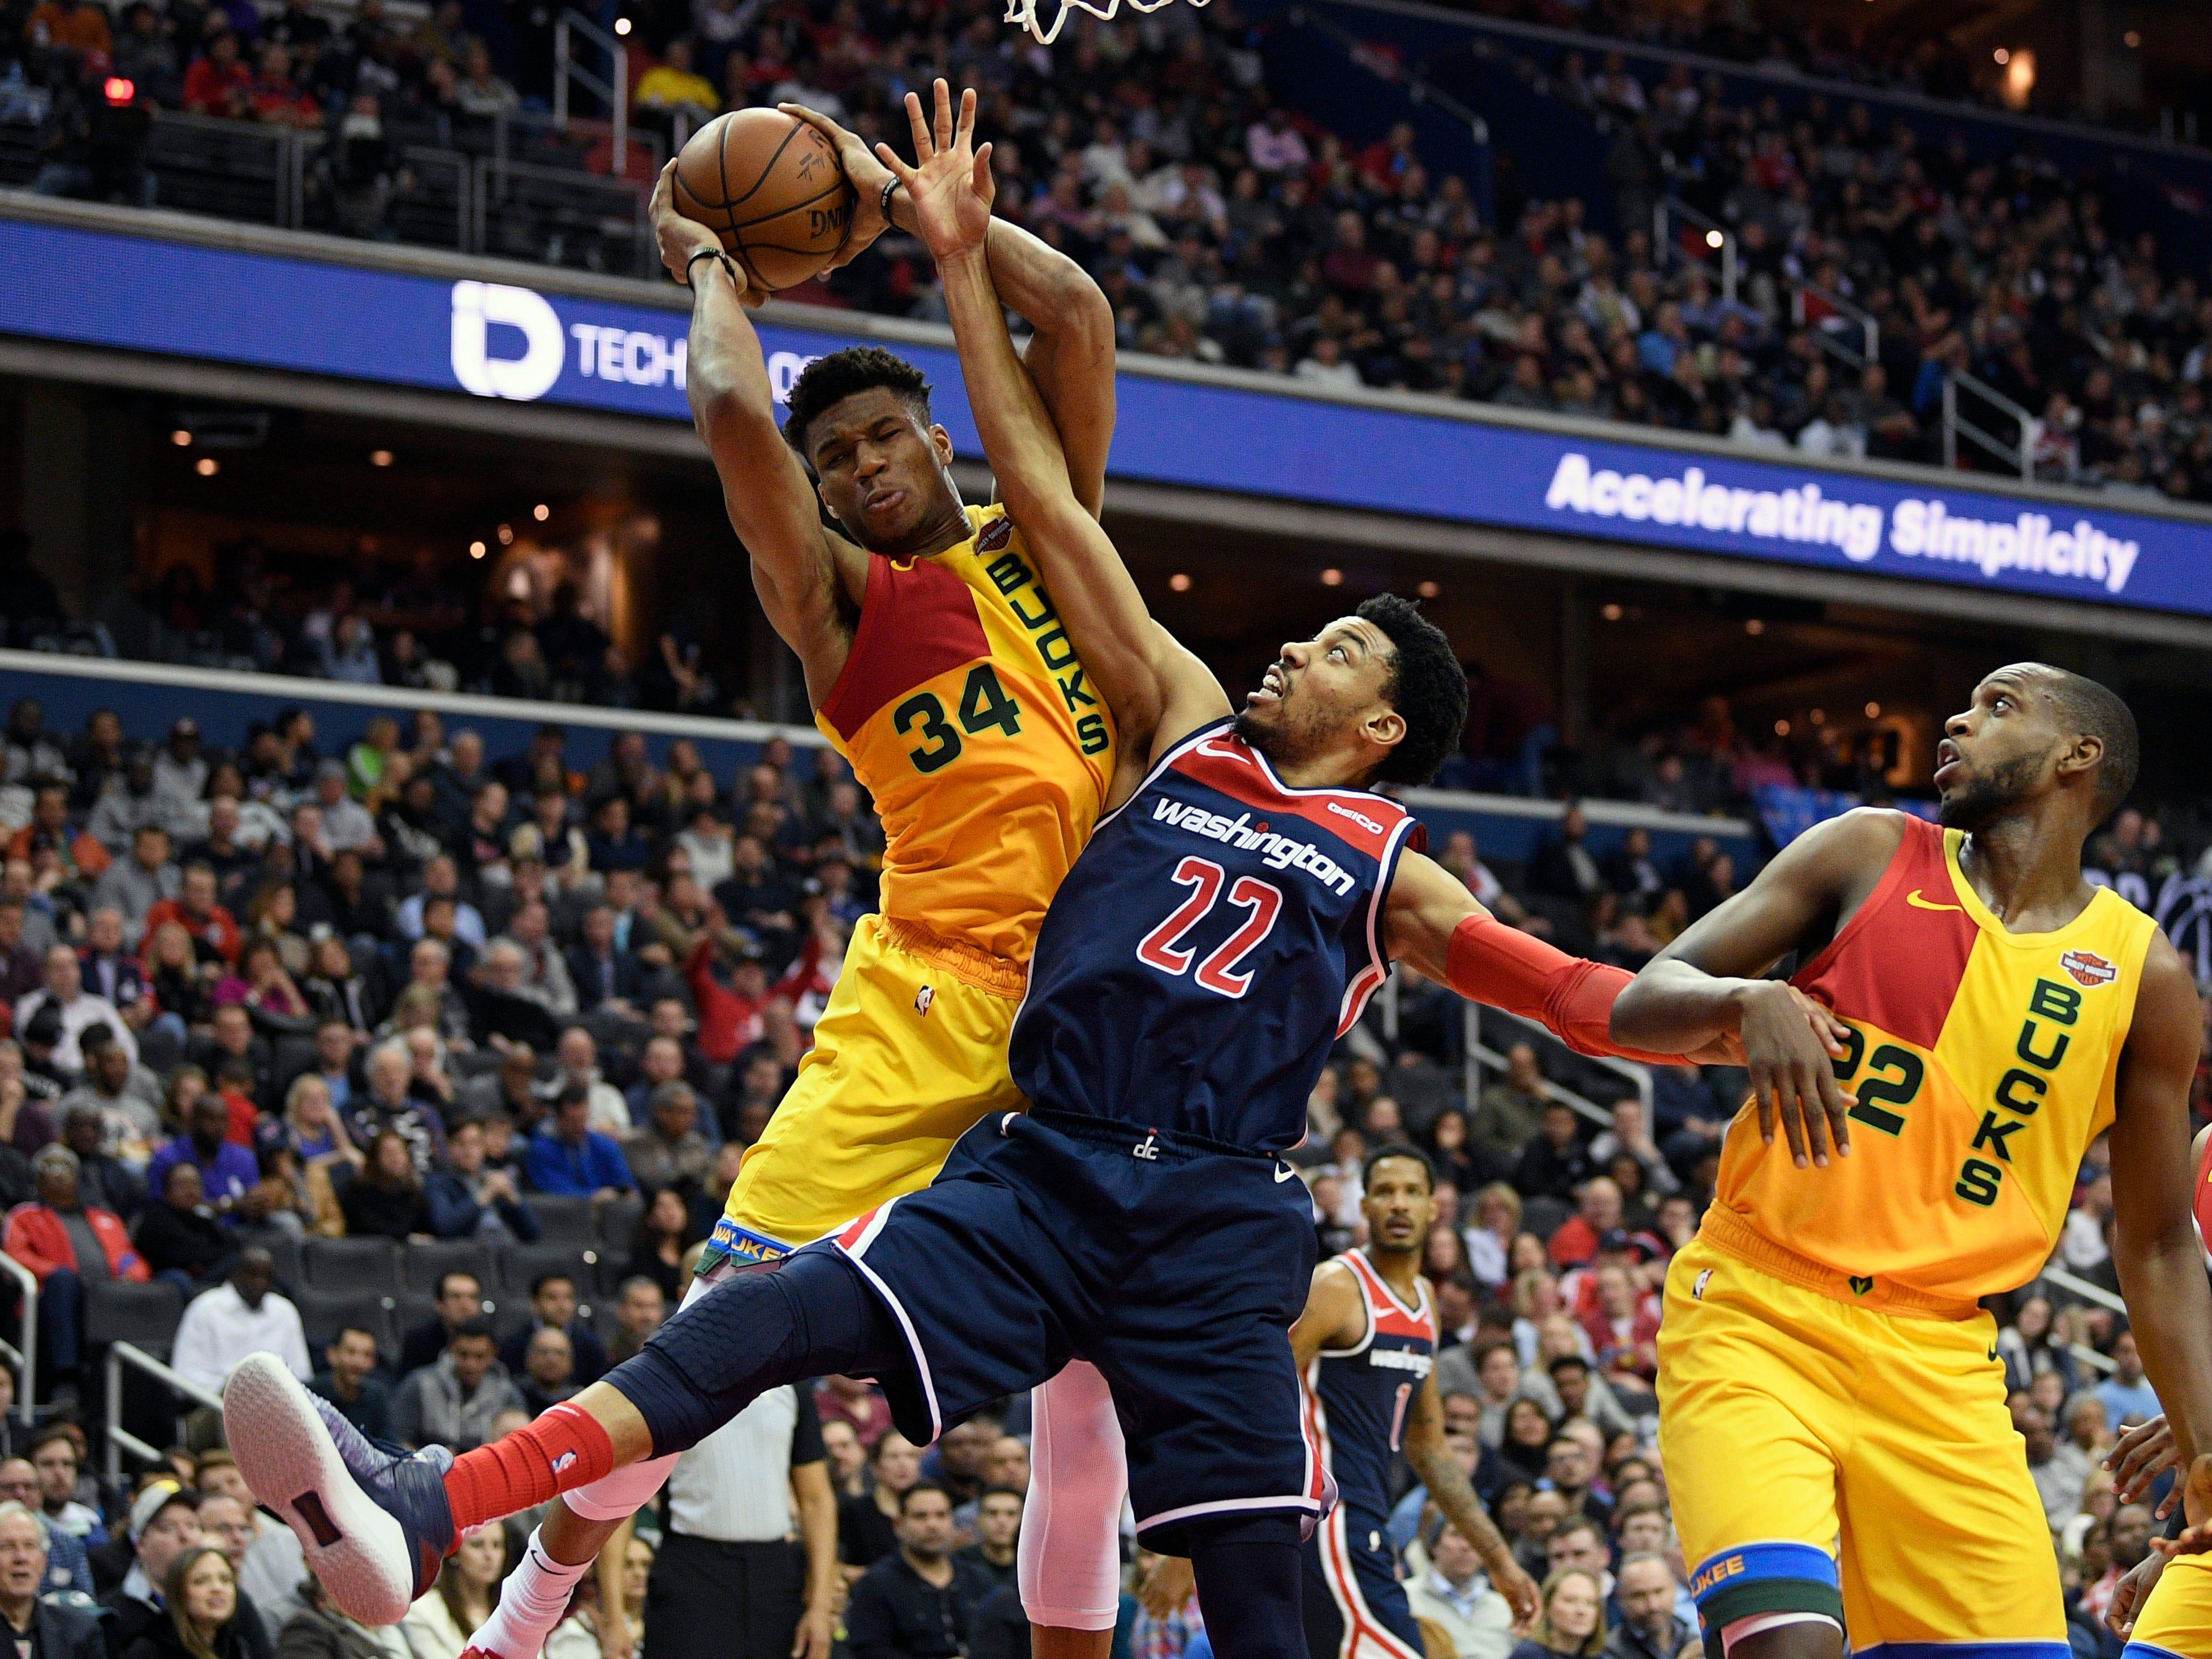 Bucks forward Giannis Antetokounmpo rips down a rebound against Wizards forward Otto Porter Jr. during the first half Saturday.